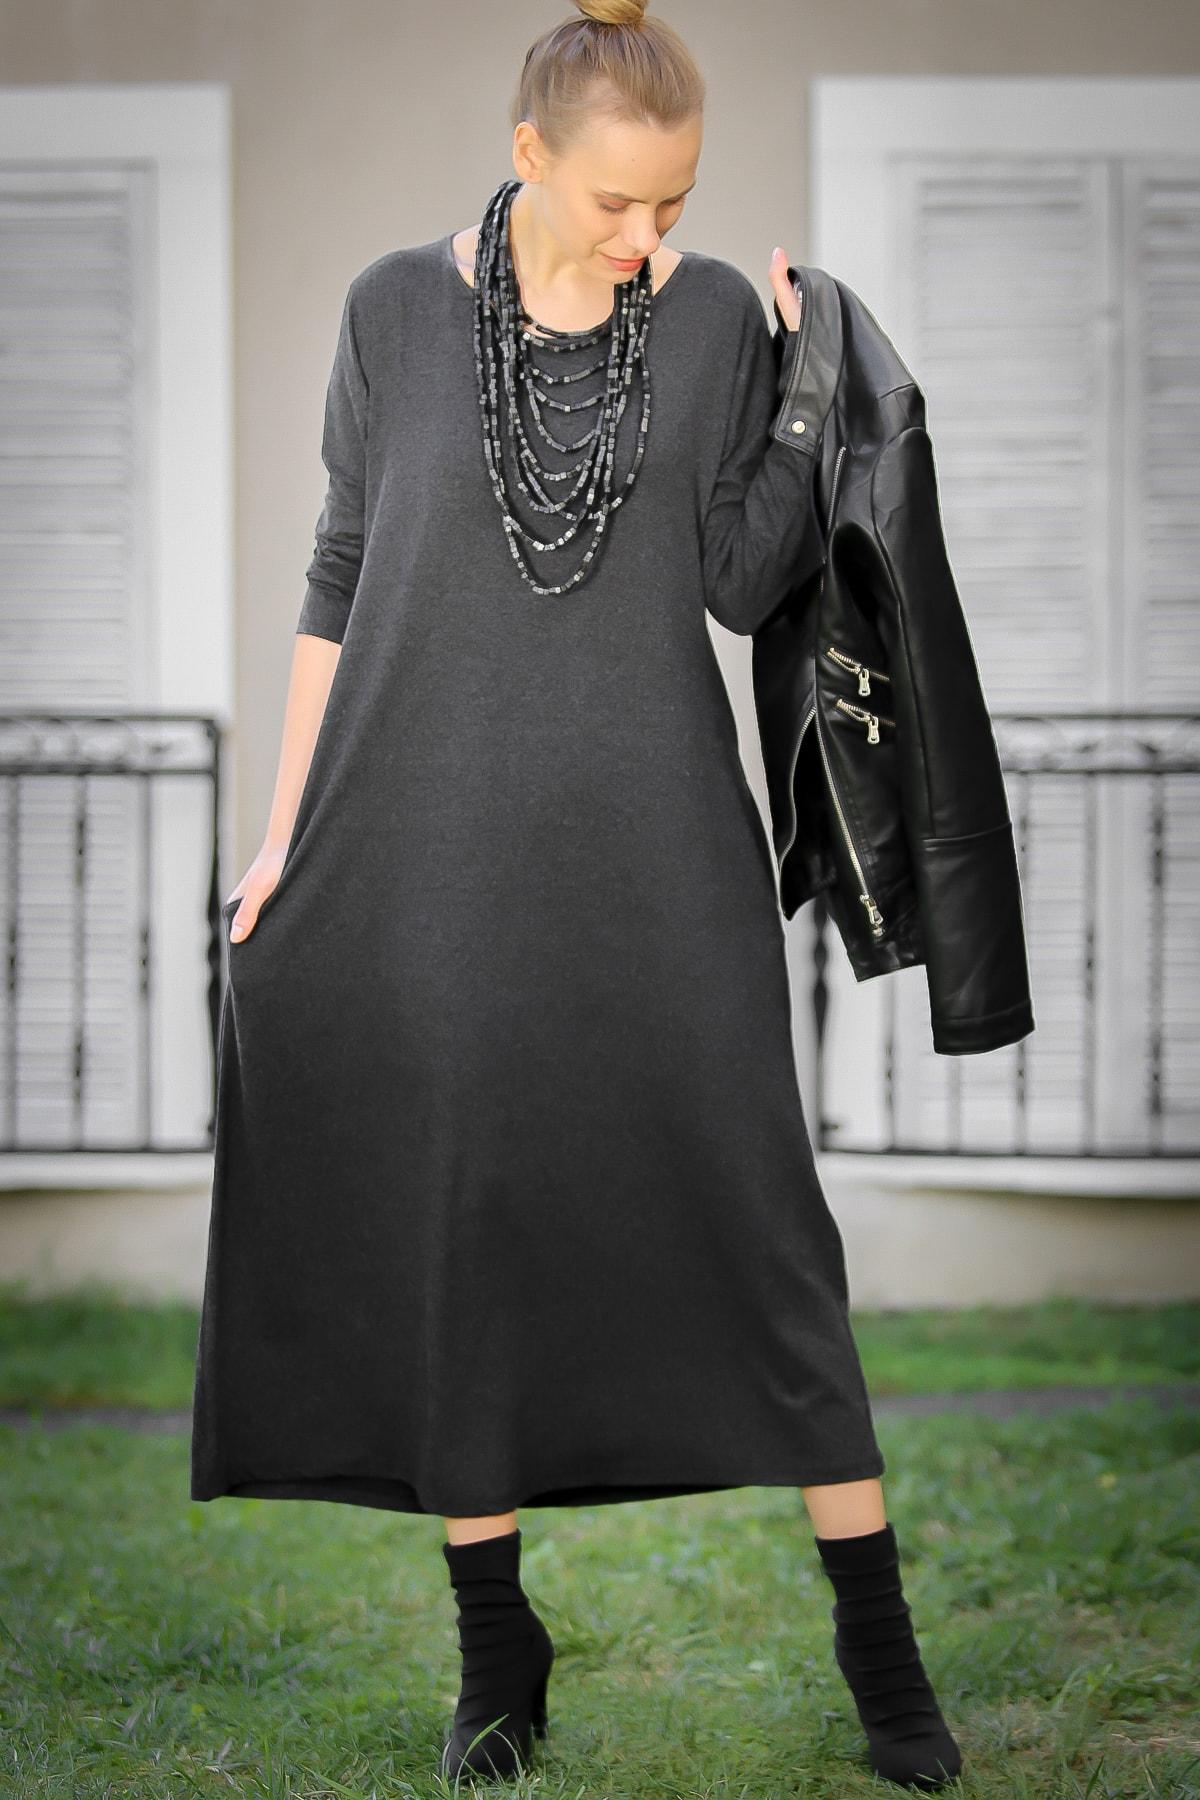 Chiccy Kadın Füme Gizli Cepli Yumoş Elbise C10160000EL97527 1